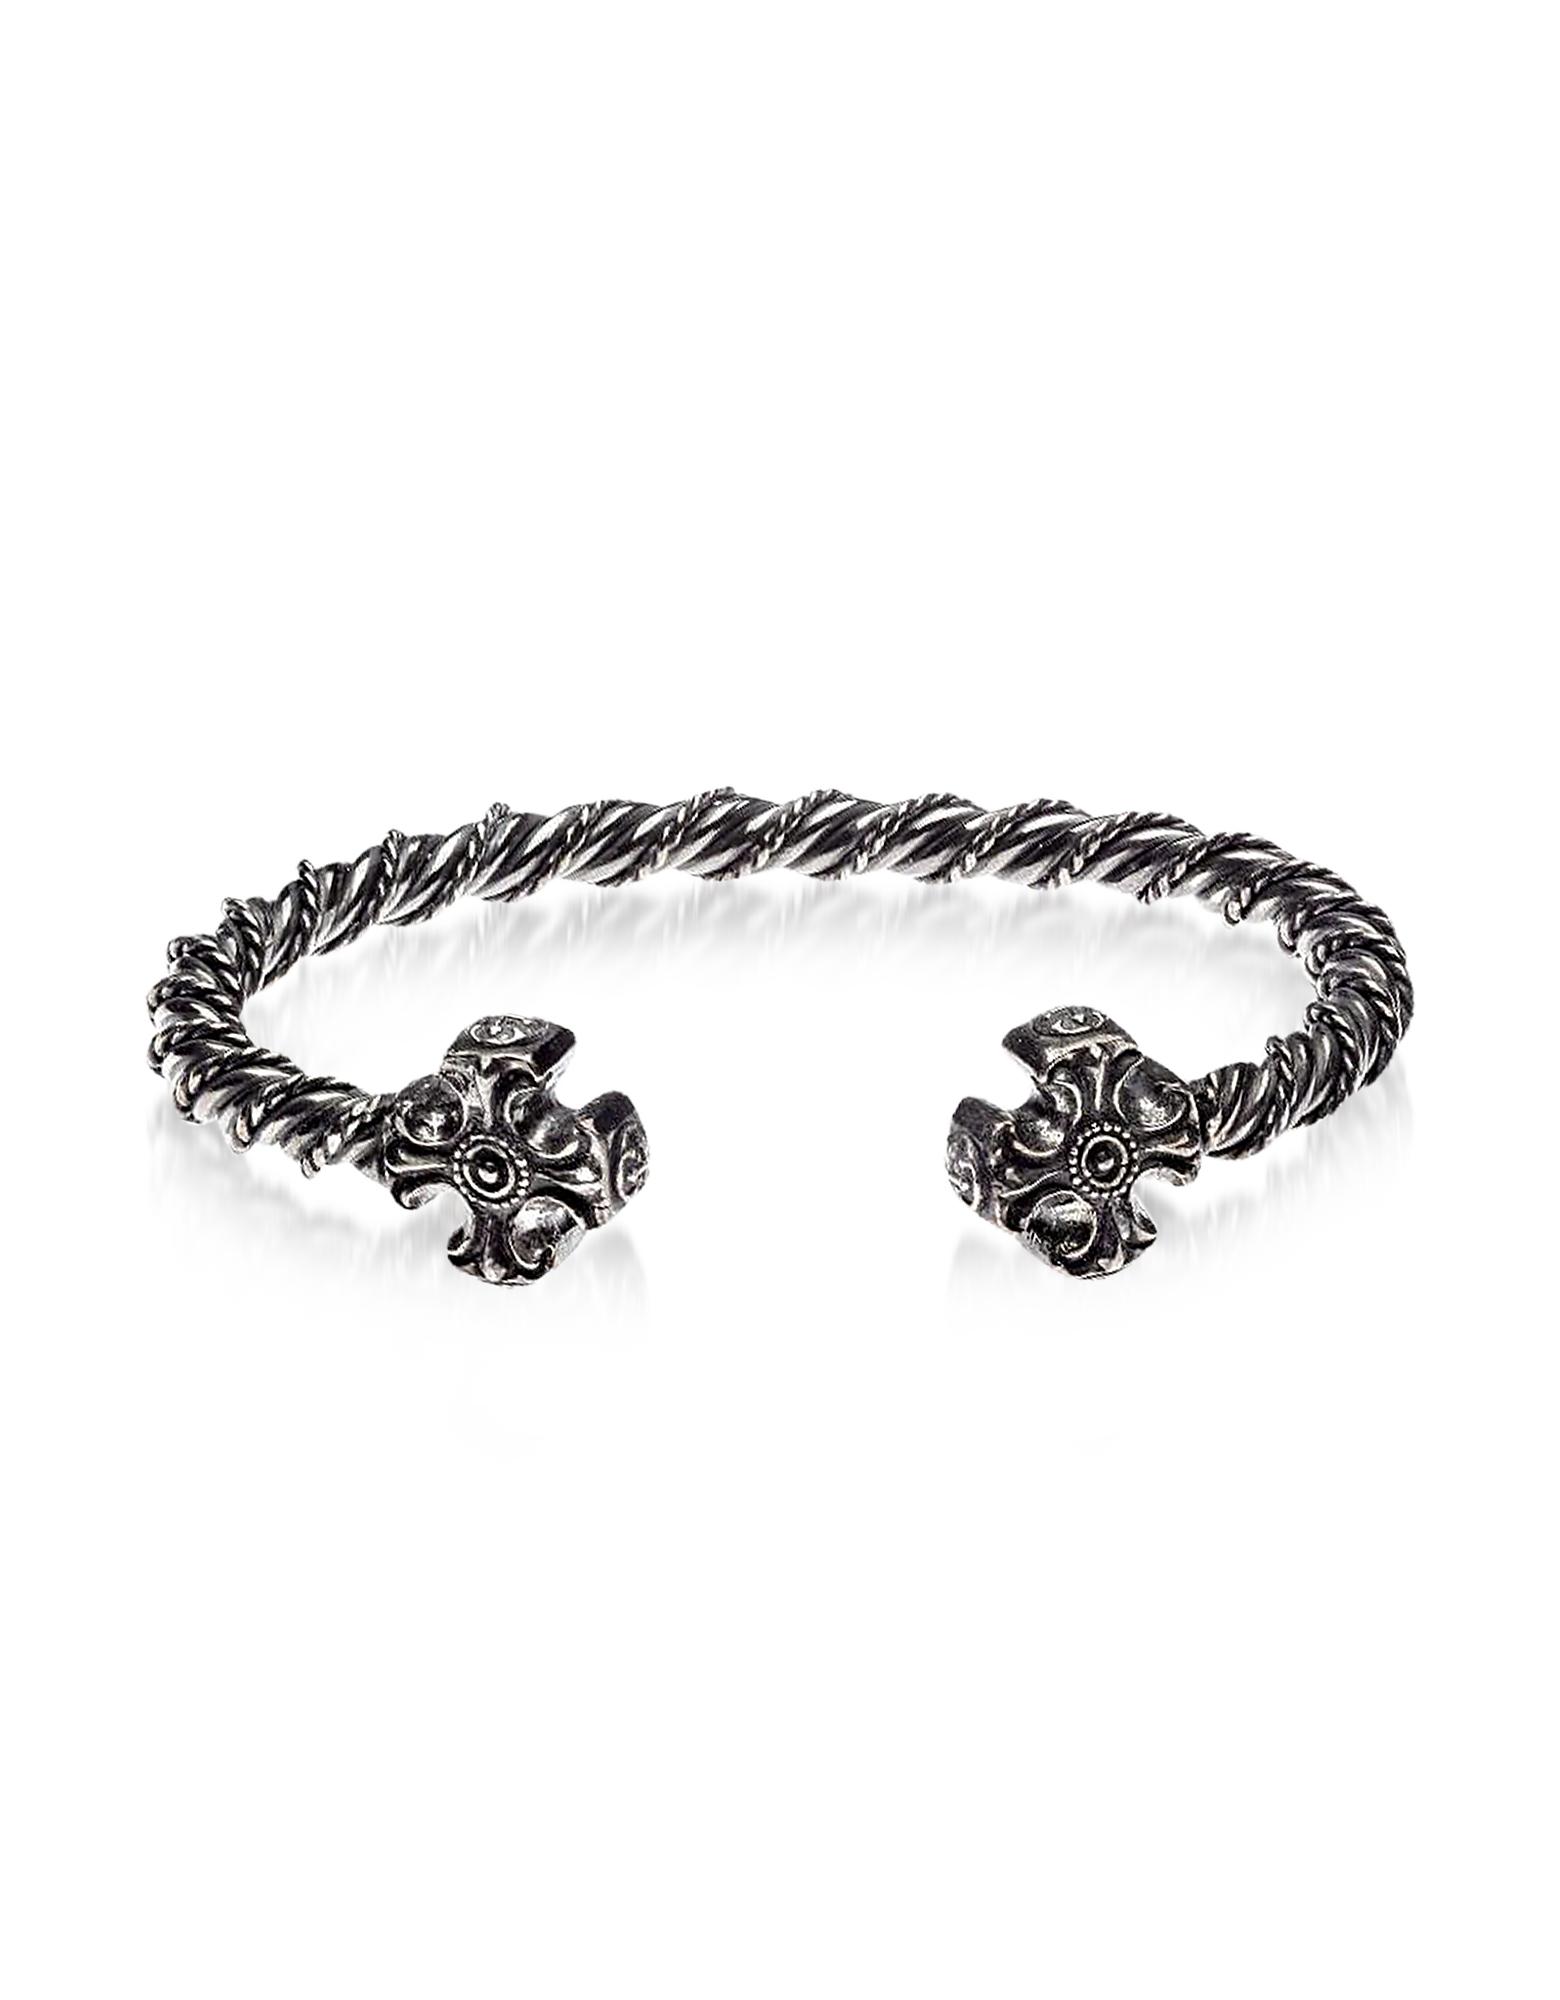 Gothic Knitted Bracelet